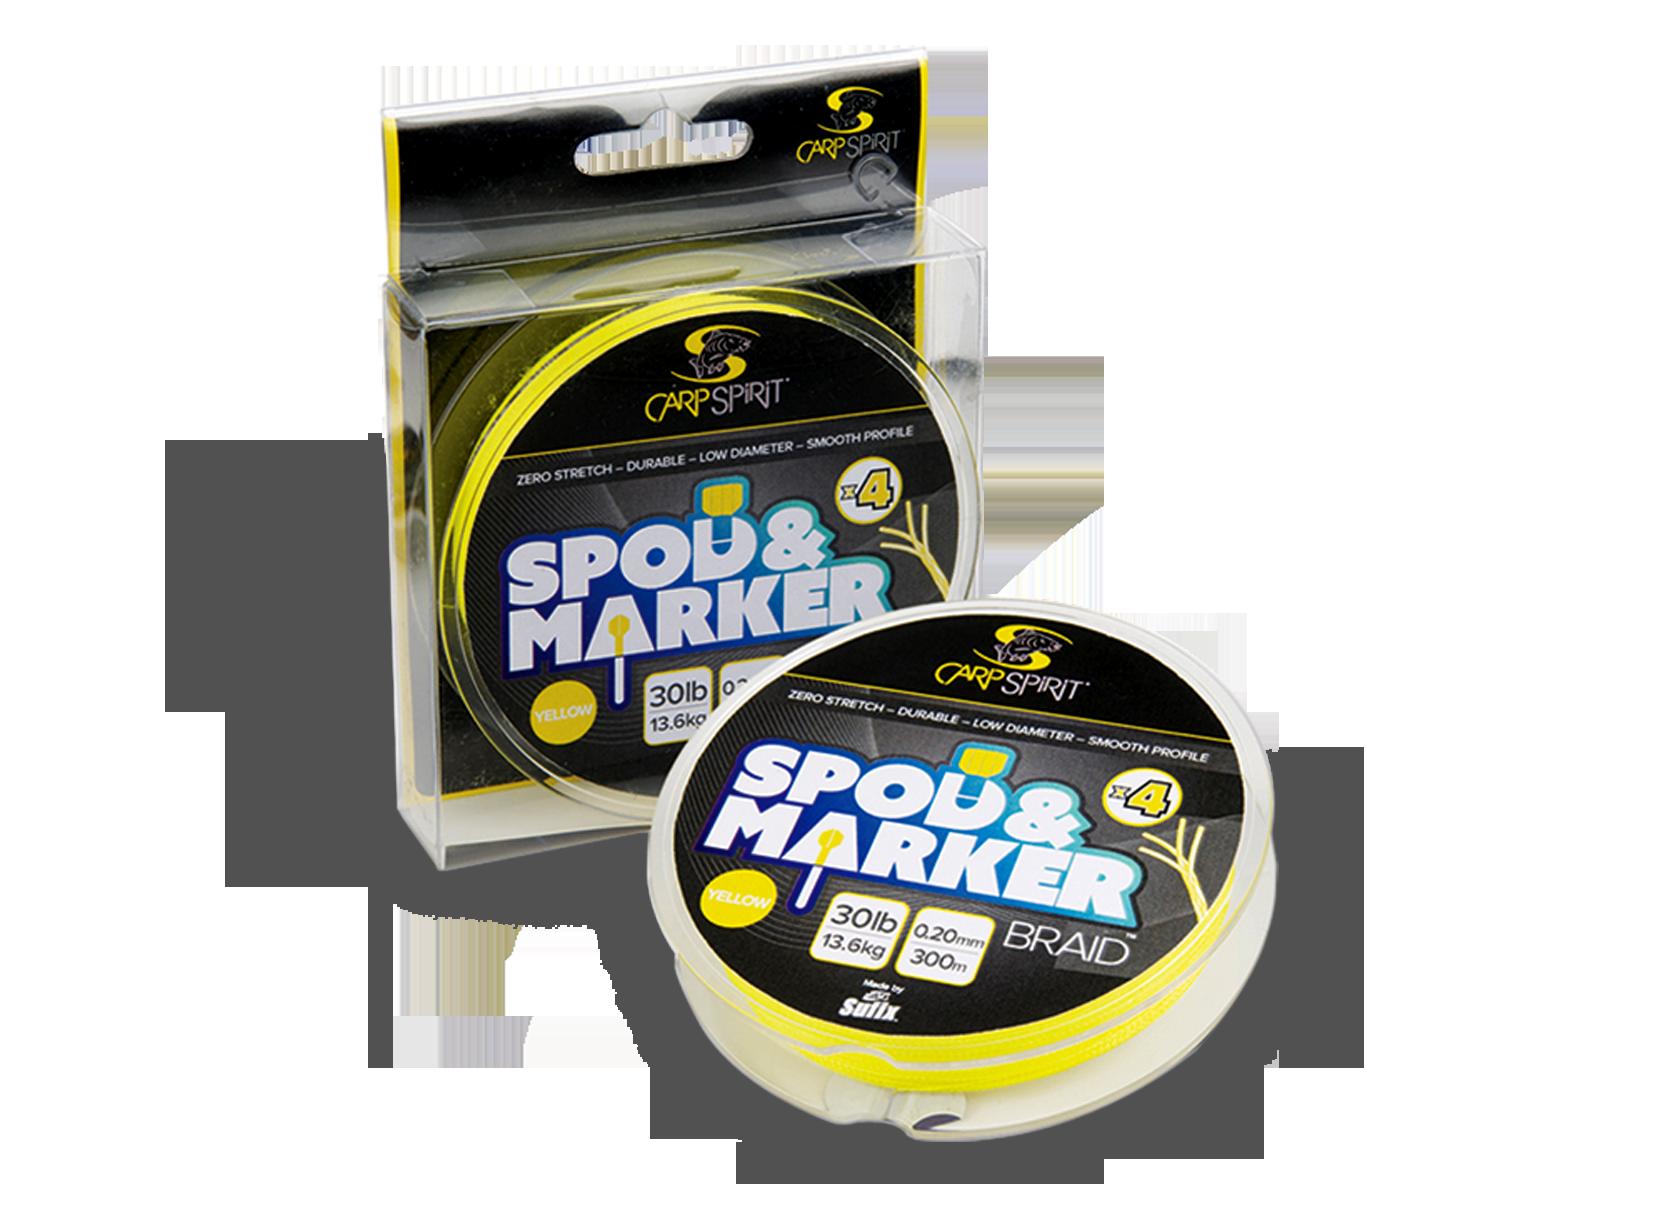 CS---Spod-&-Marker-Yellow-Pack.png